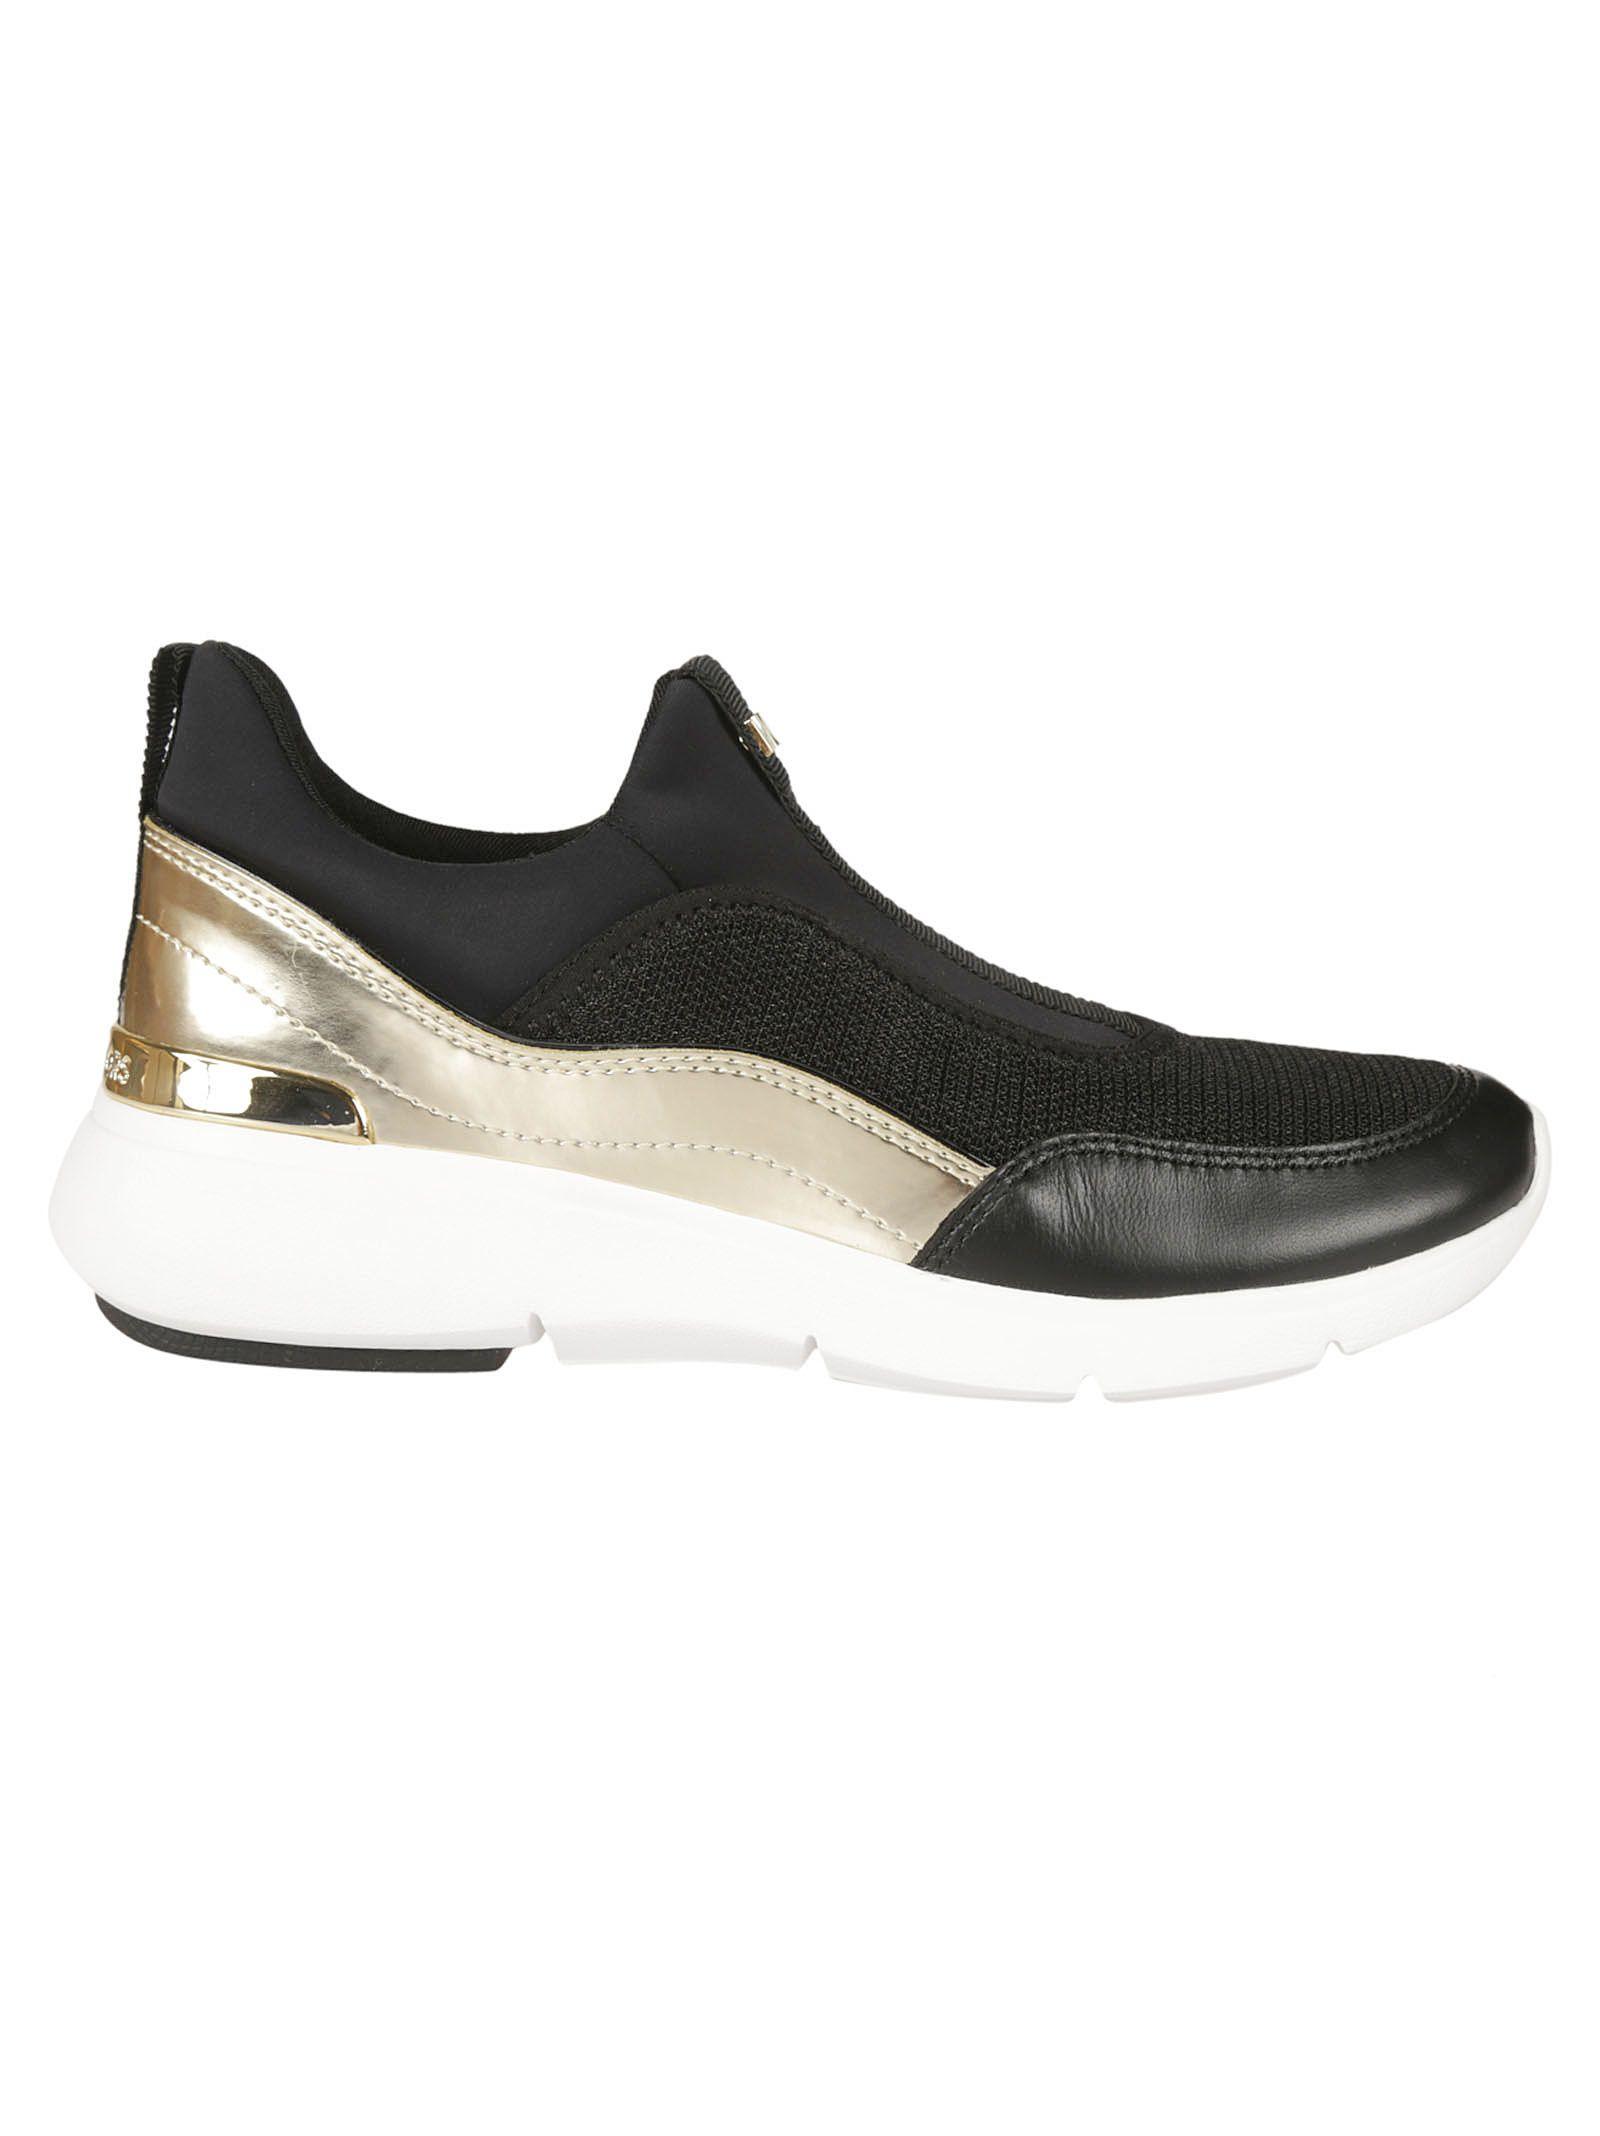 Ace slip-on sneakers - Black Michael Michael Kors L9cUmM